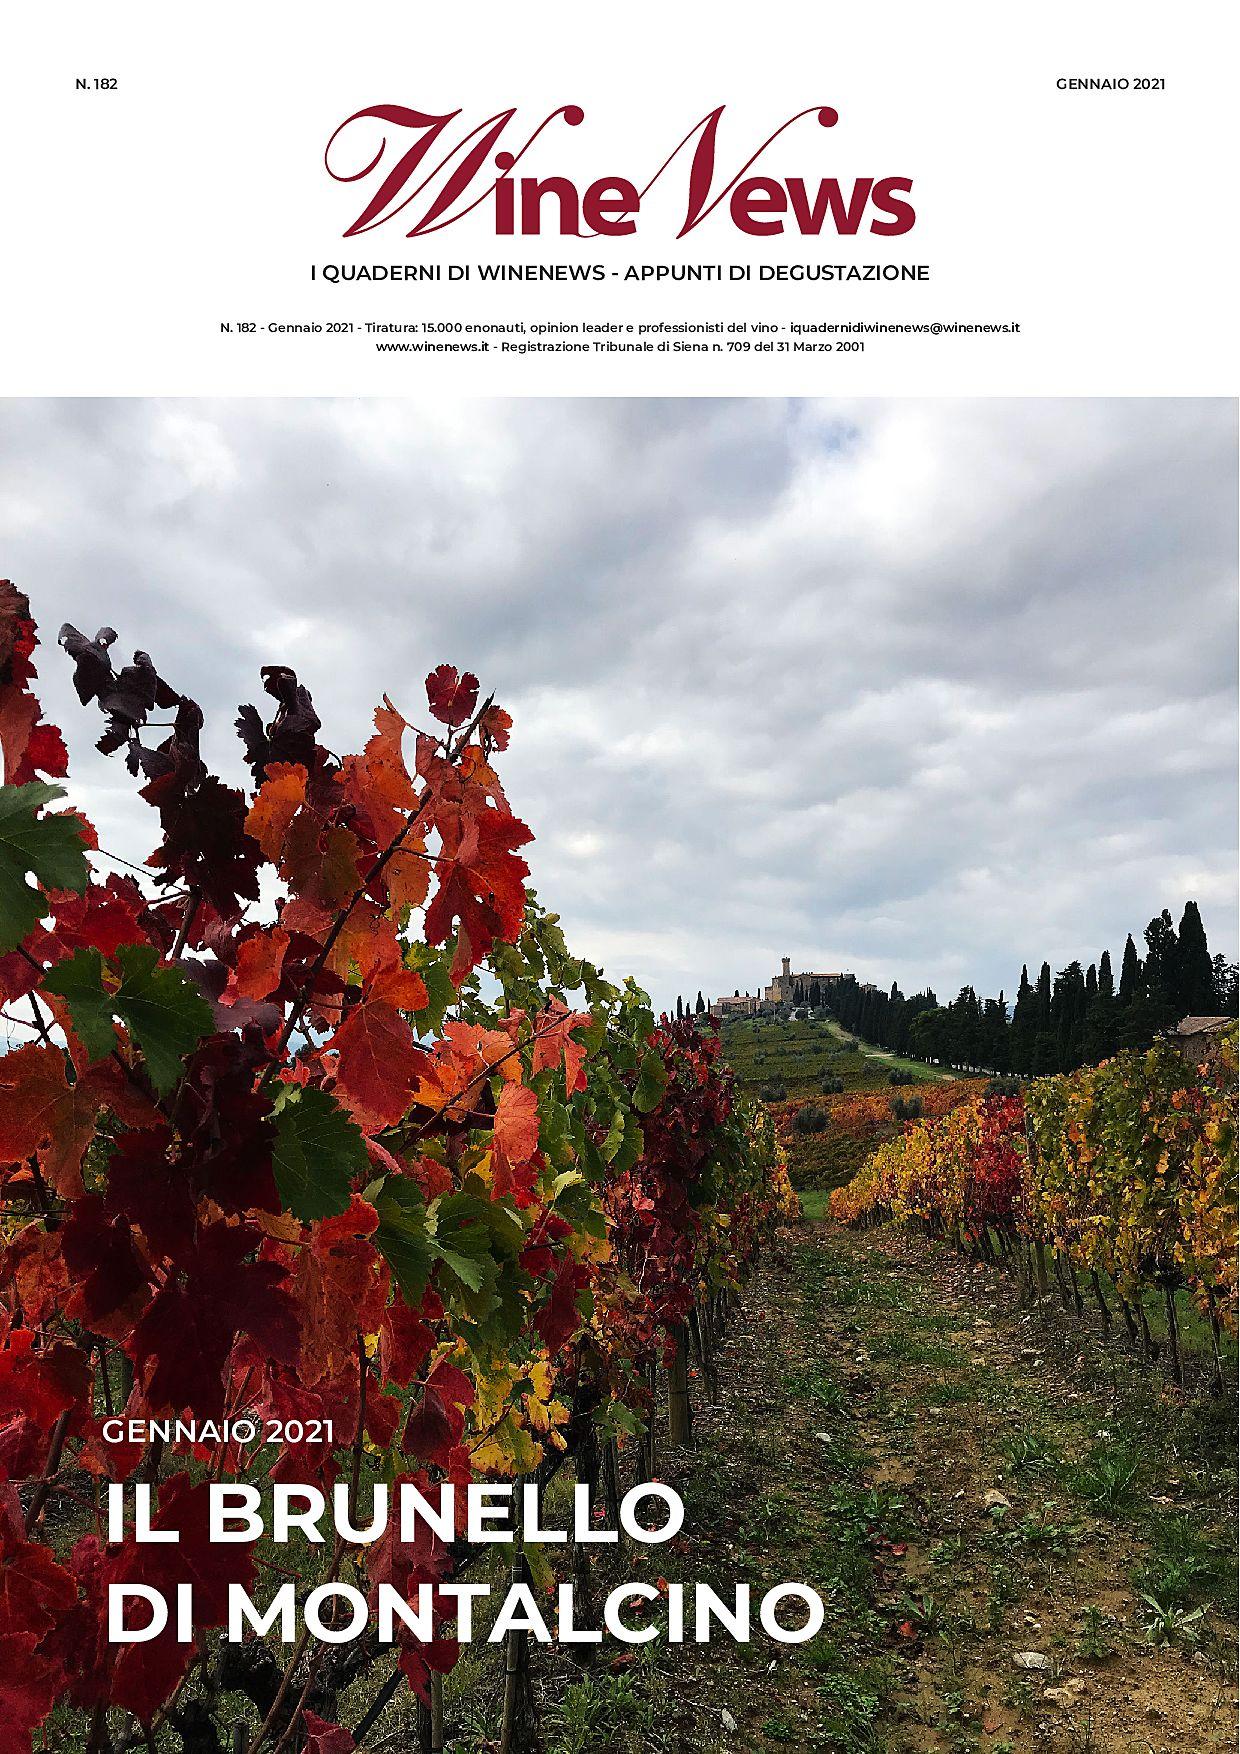 https://winenews.it/php/redirect_pdf.php?id=434501&t=1611415883